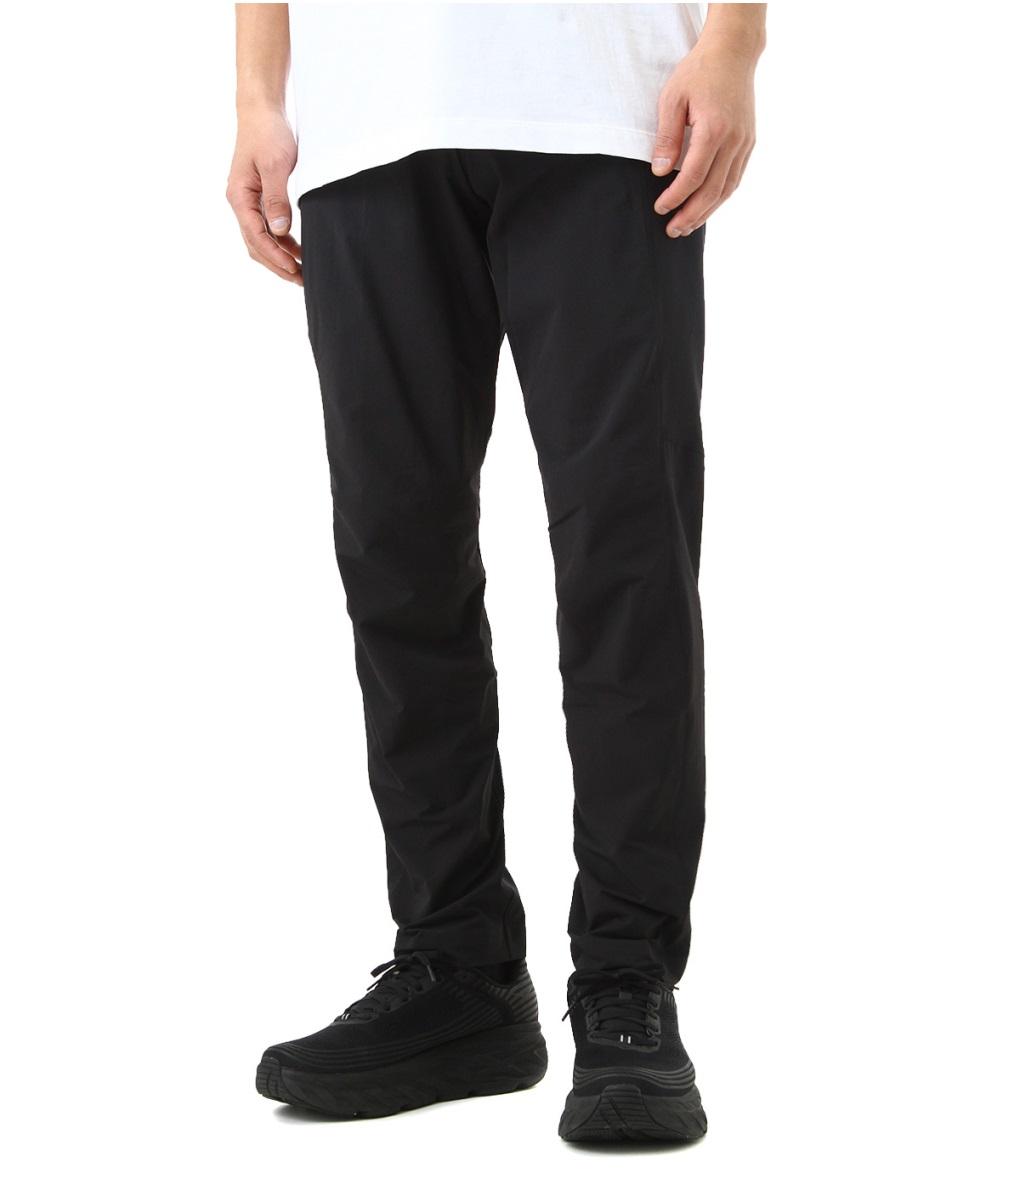 ARC'TERYX / アークテリクス : Sabreo Pant Mena's (Short Leg) : スポーツ アークテリクス セイバー パンツ メンズ : L07148500 【STD】